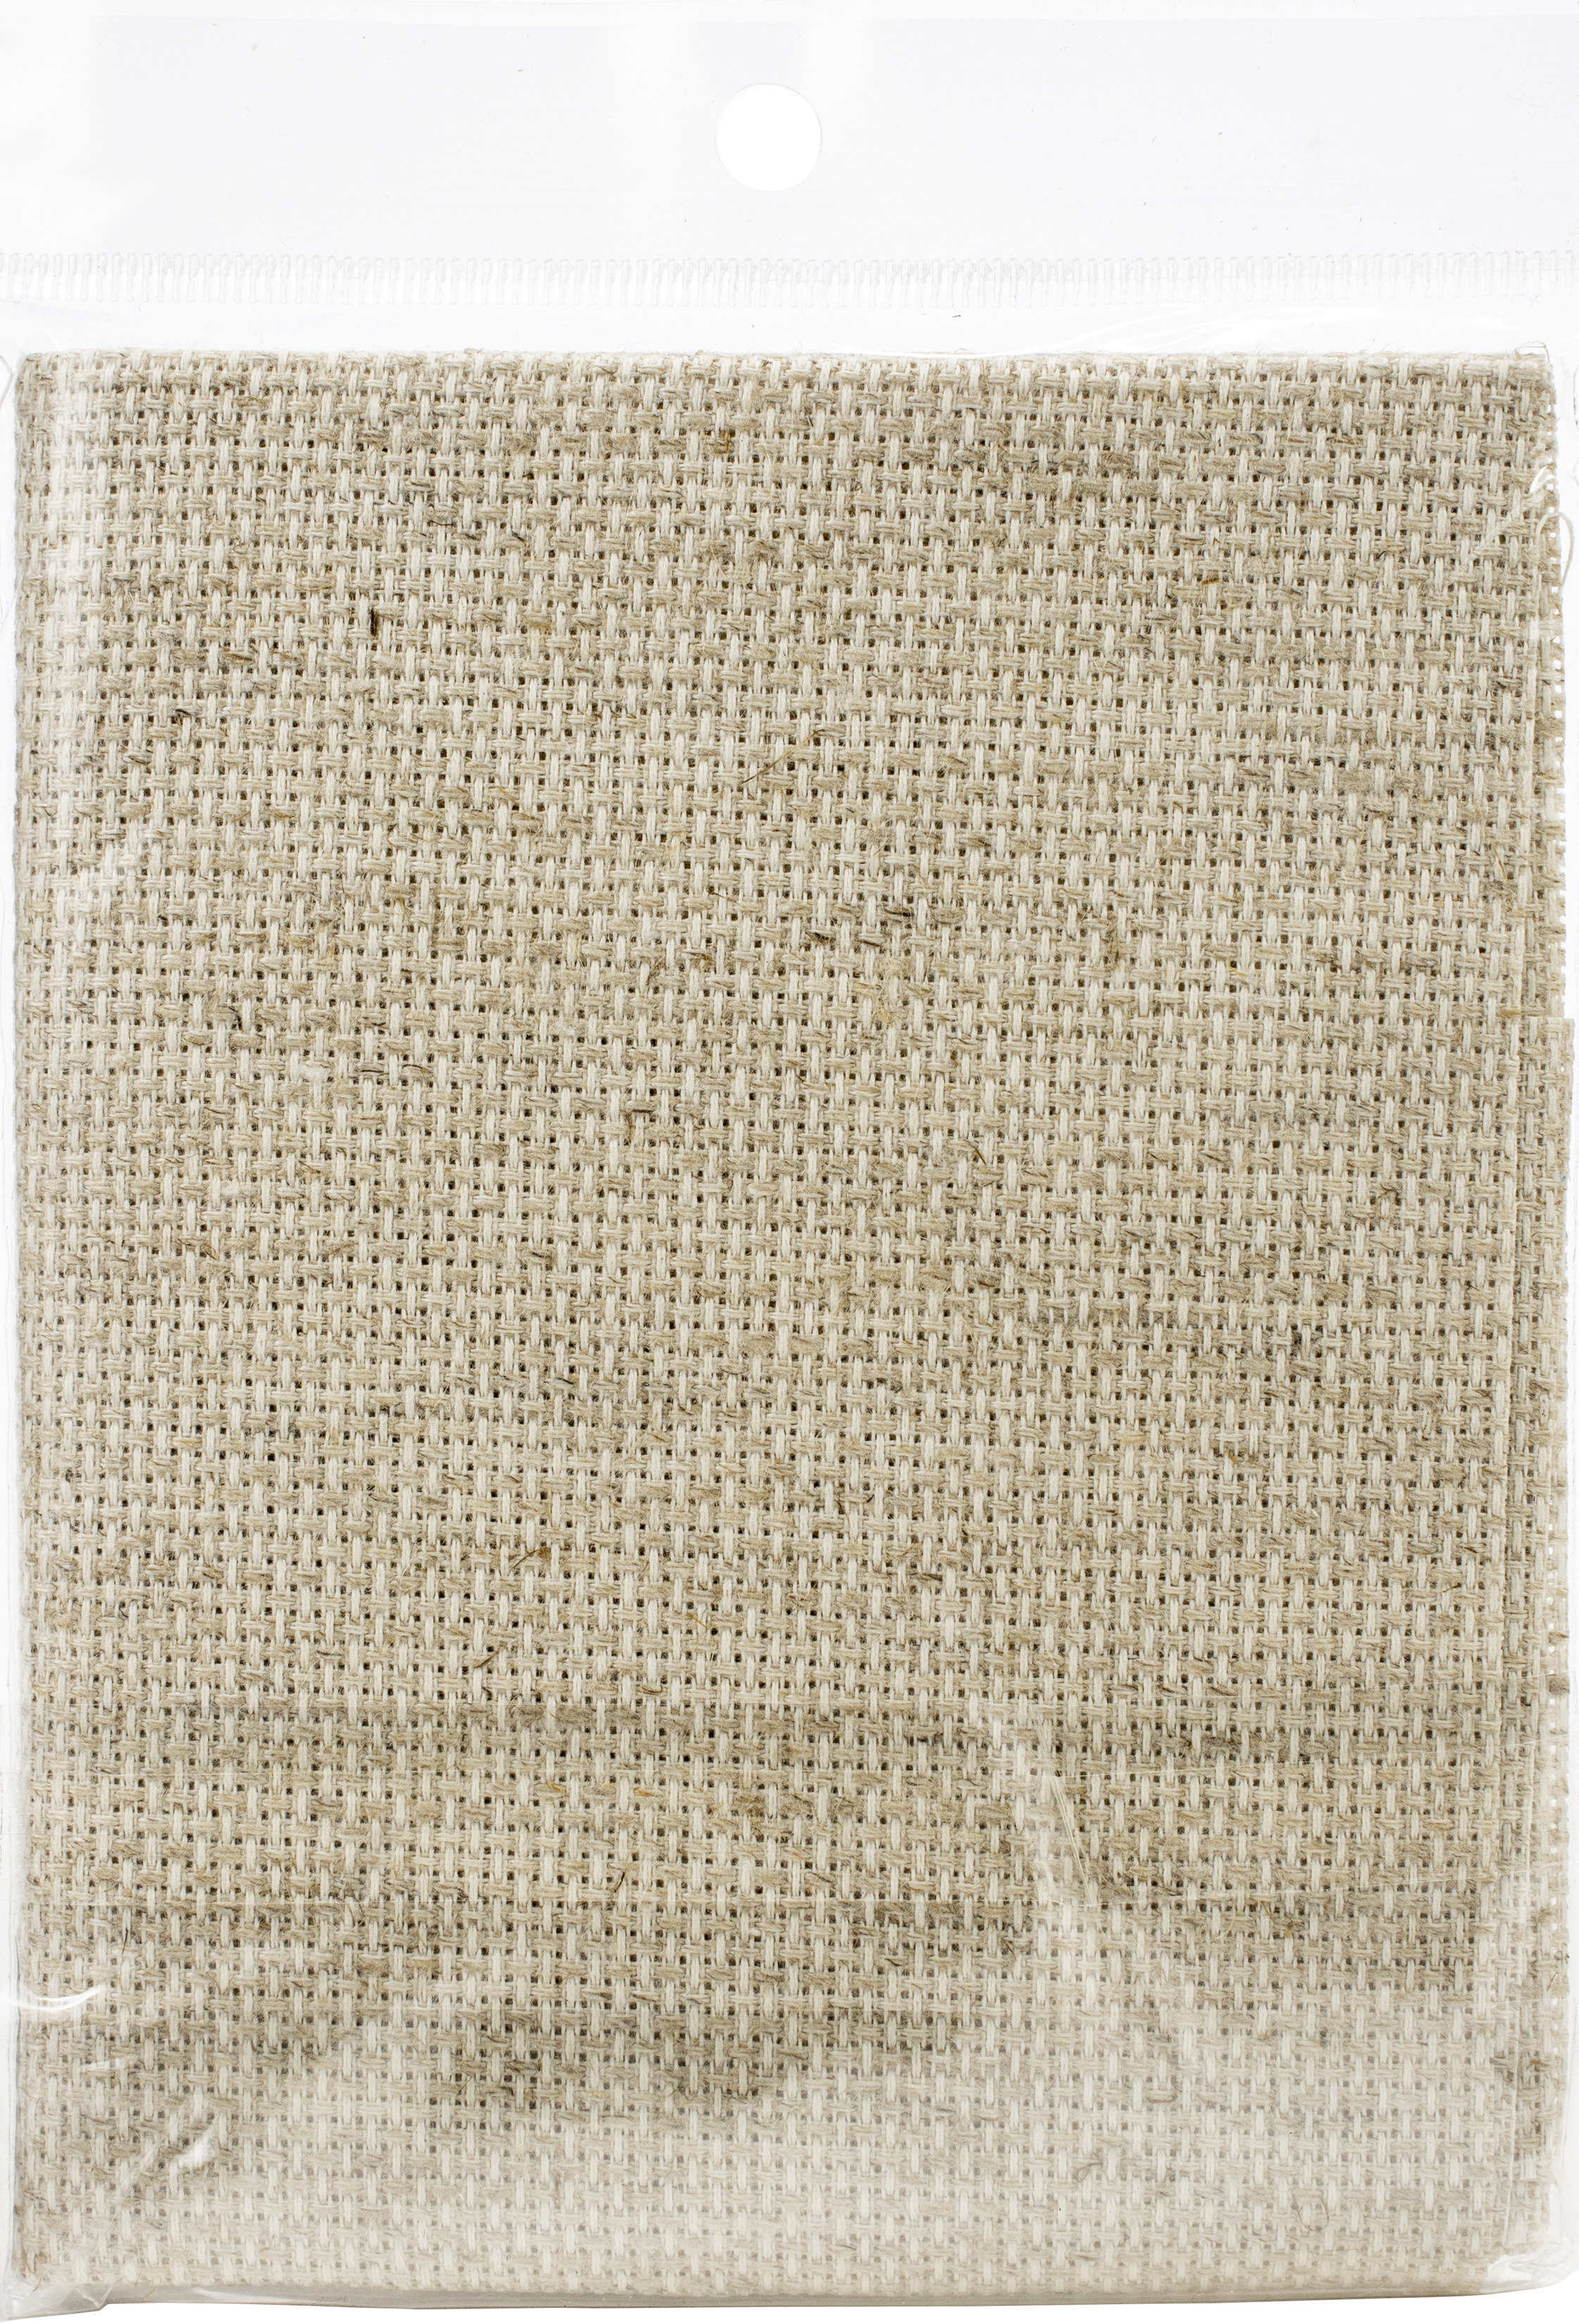 Aida Cloth 15x18 - Oatmeal